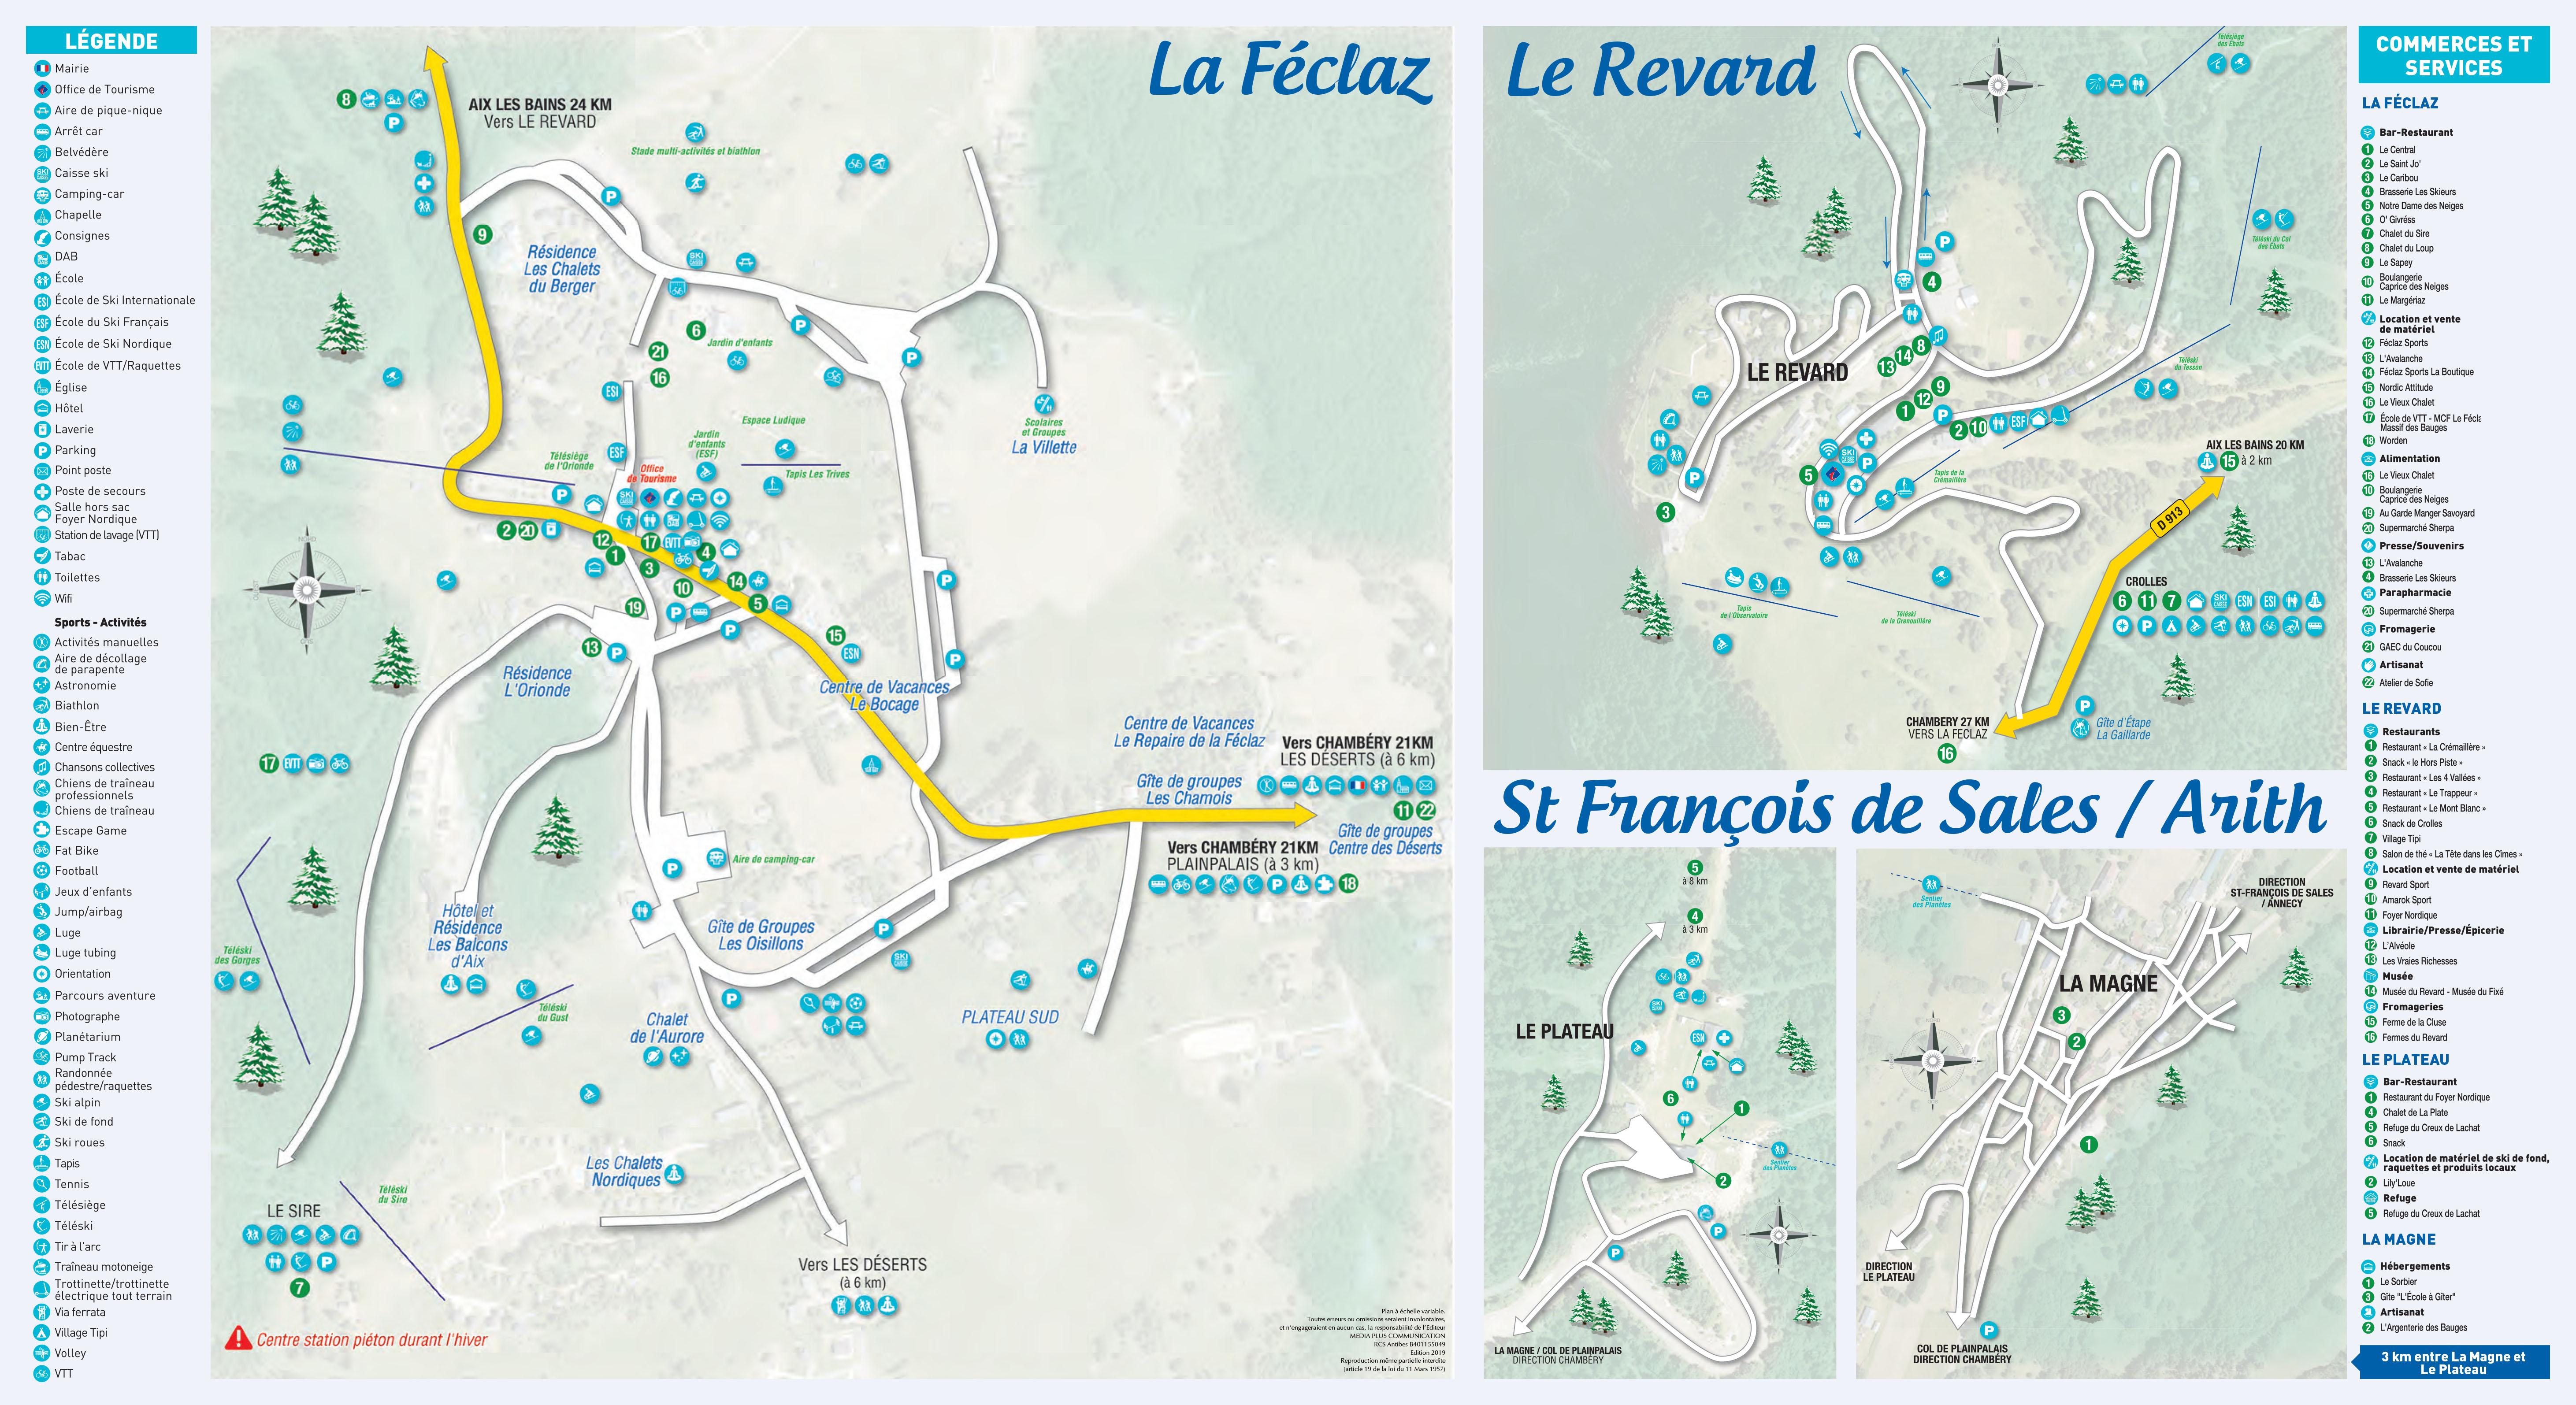 visuel-plan-pour-web-508